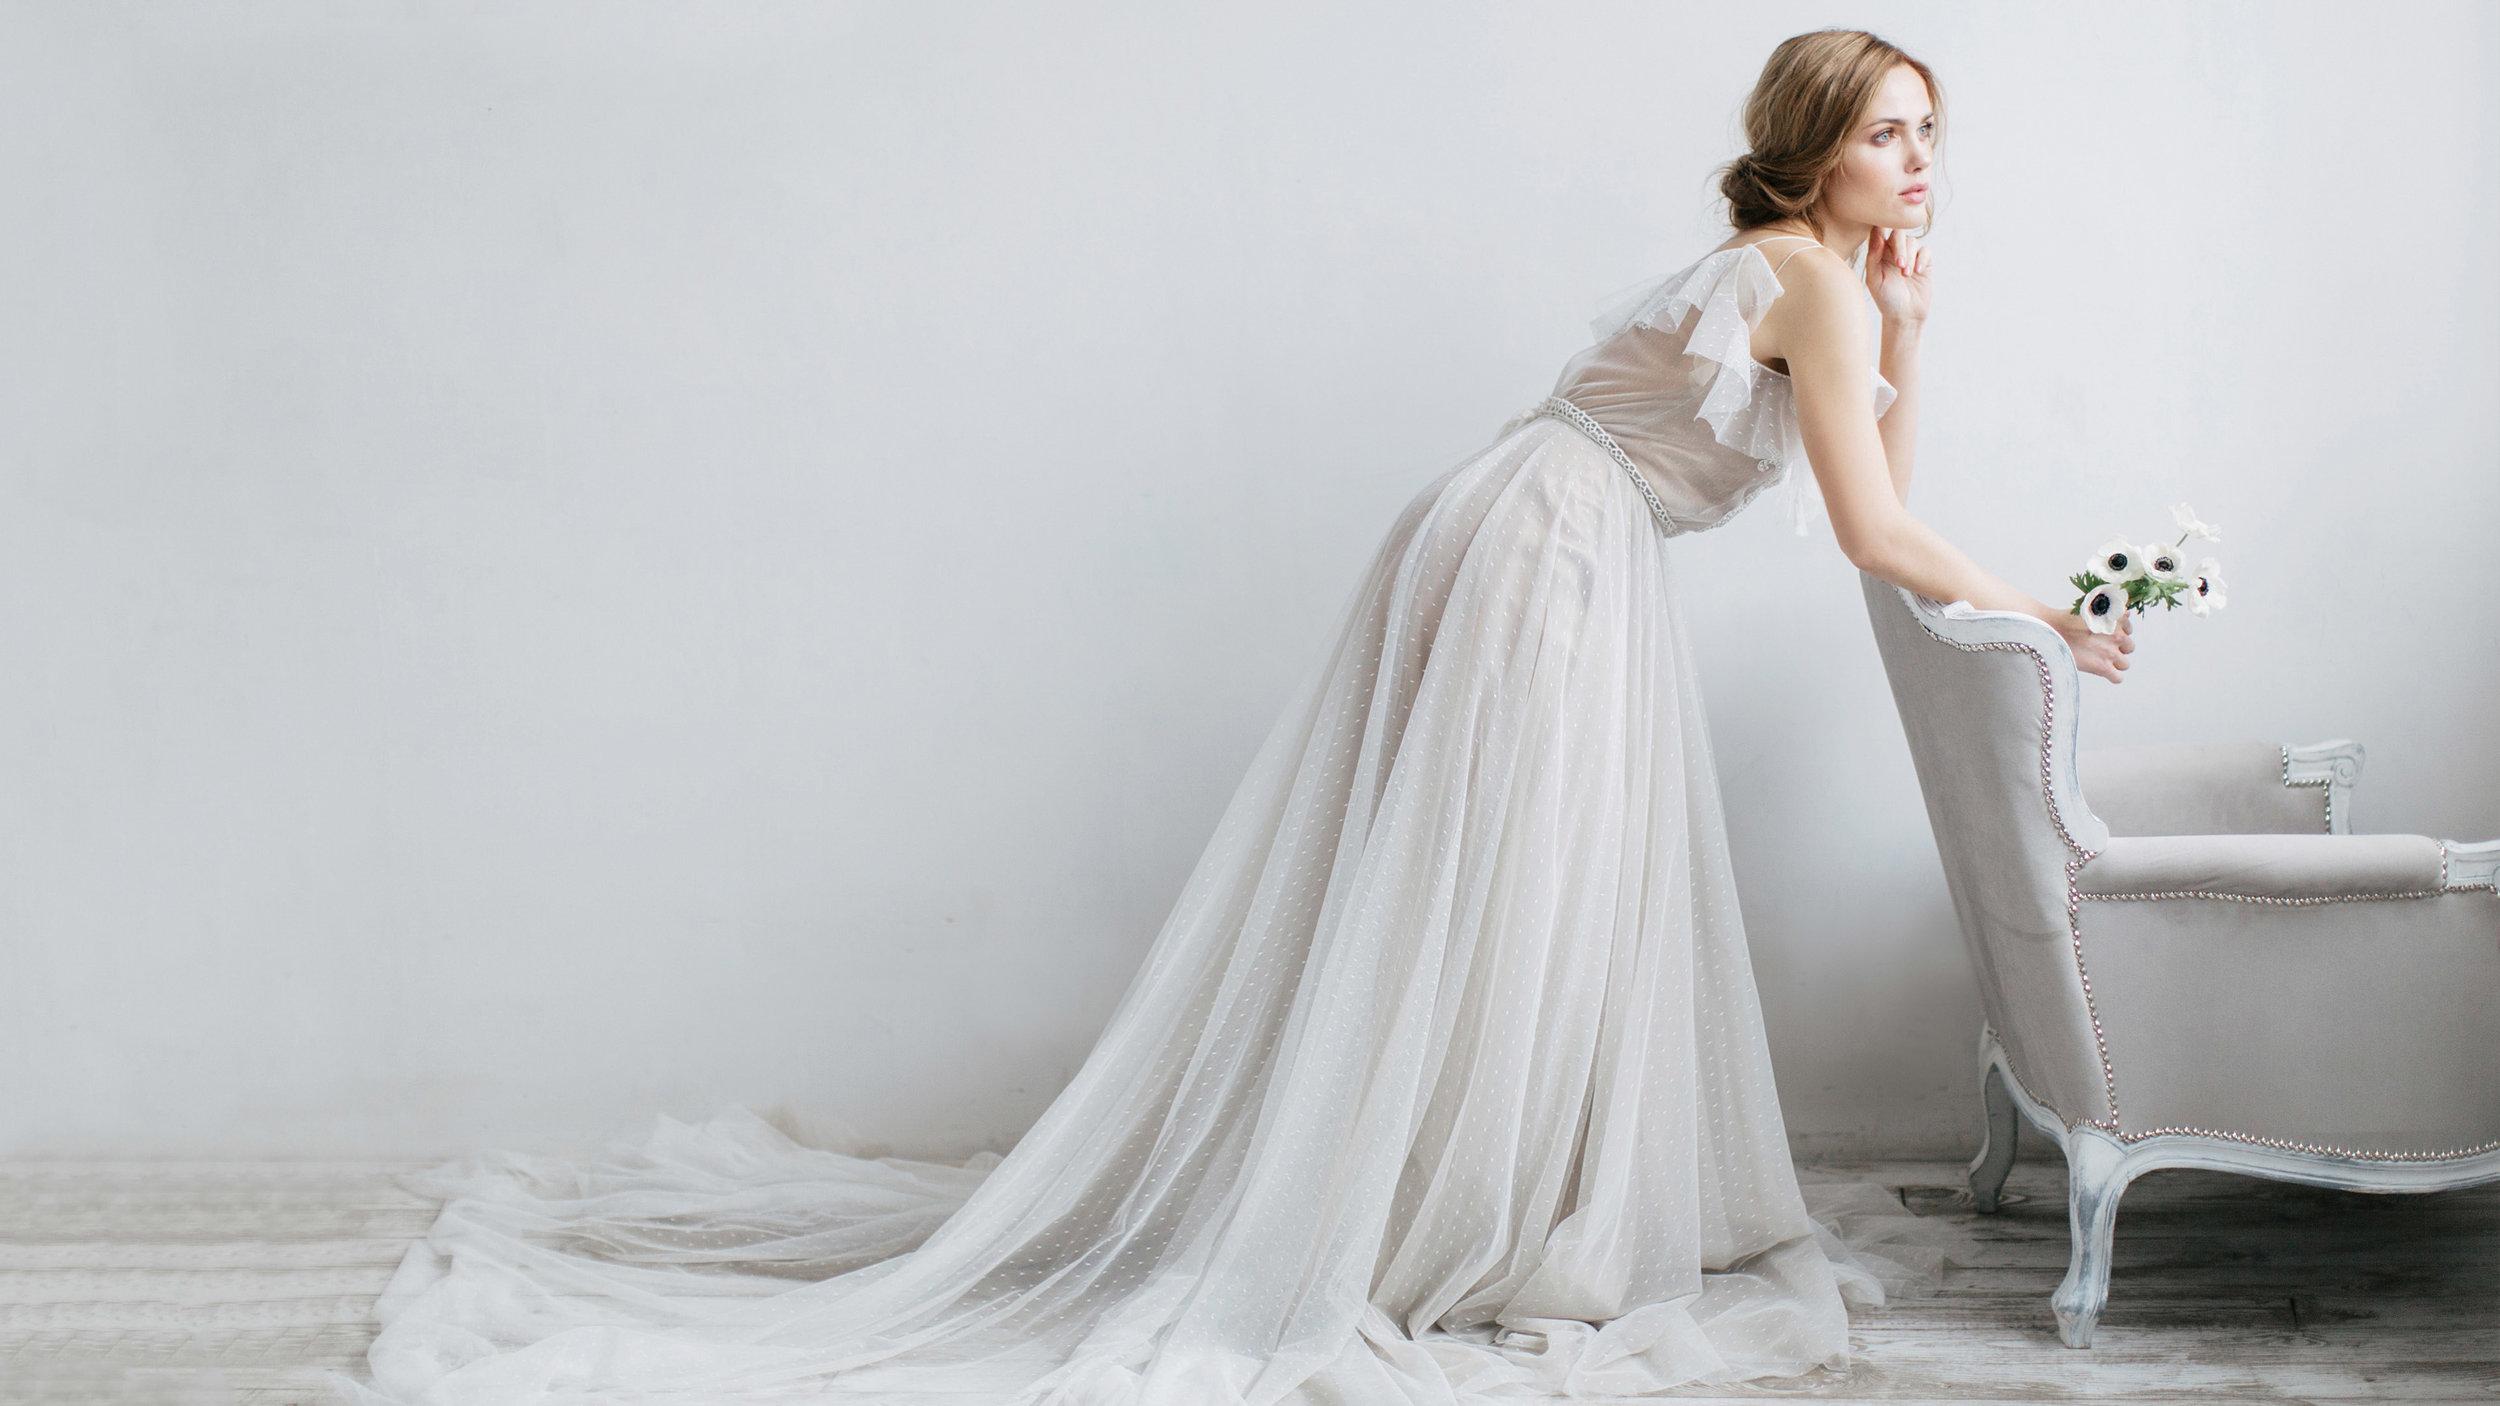 - The New Art of Bridal Gown ShoppingBy: Natalia & Tatiana of Luxx-Nova